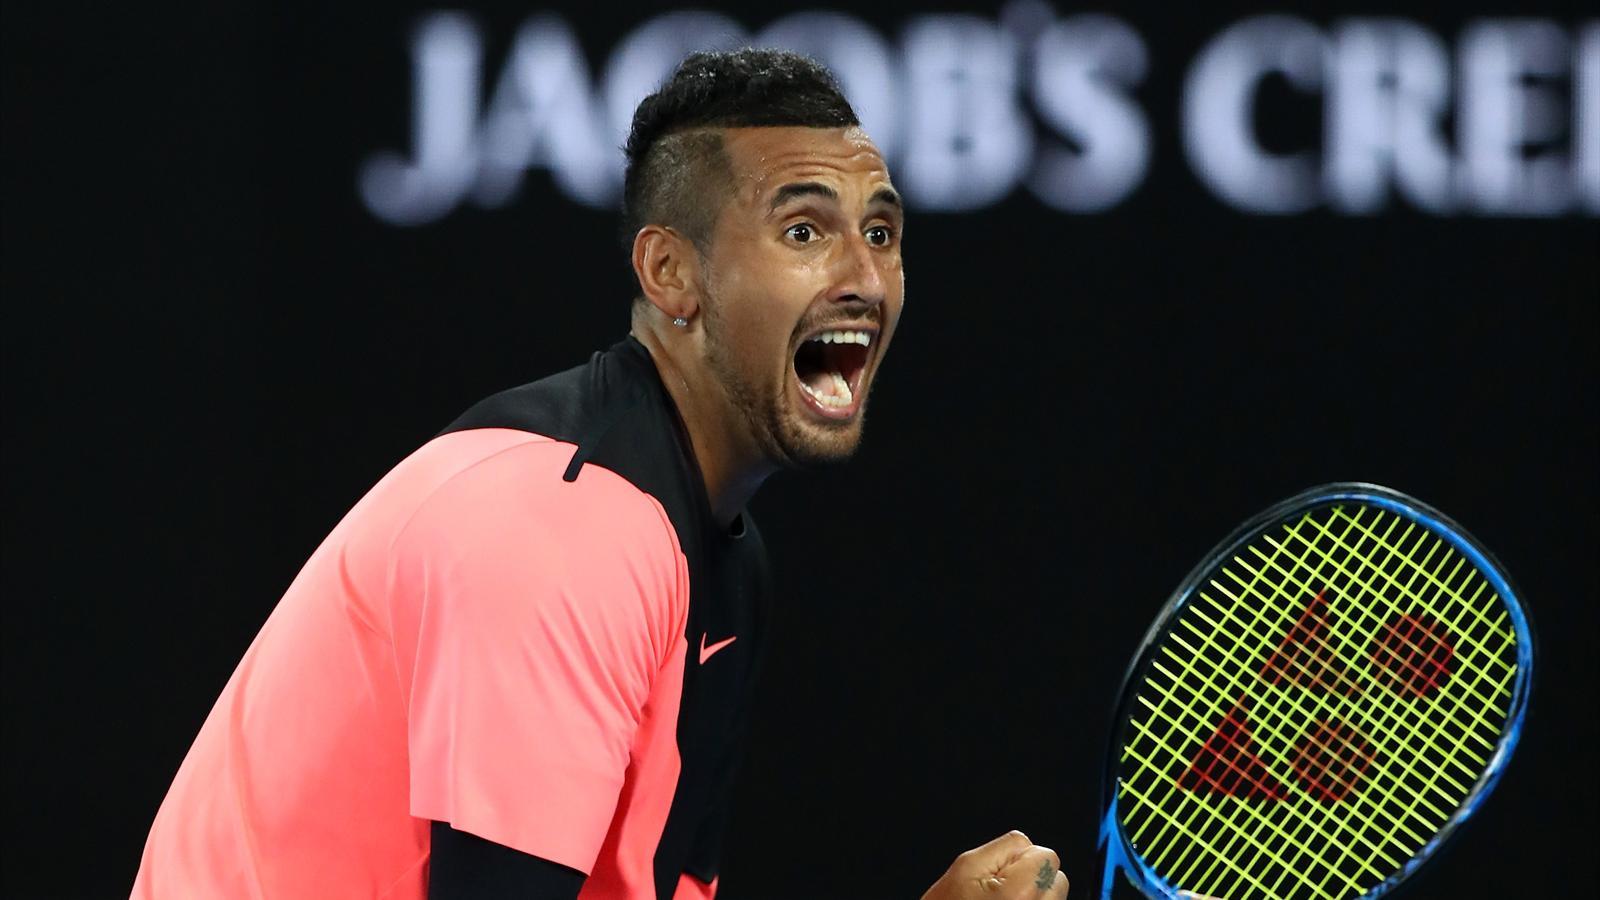 Kyrgios  U0026quot;Gagner Contre Jo Cu0026#39;est Un Ru00eave Qui Devient Ru00e9alitu00e9u0026quot; - Open Du0026#39;Australie 2018 - Tennis ...